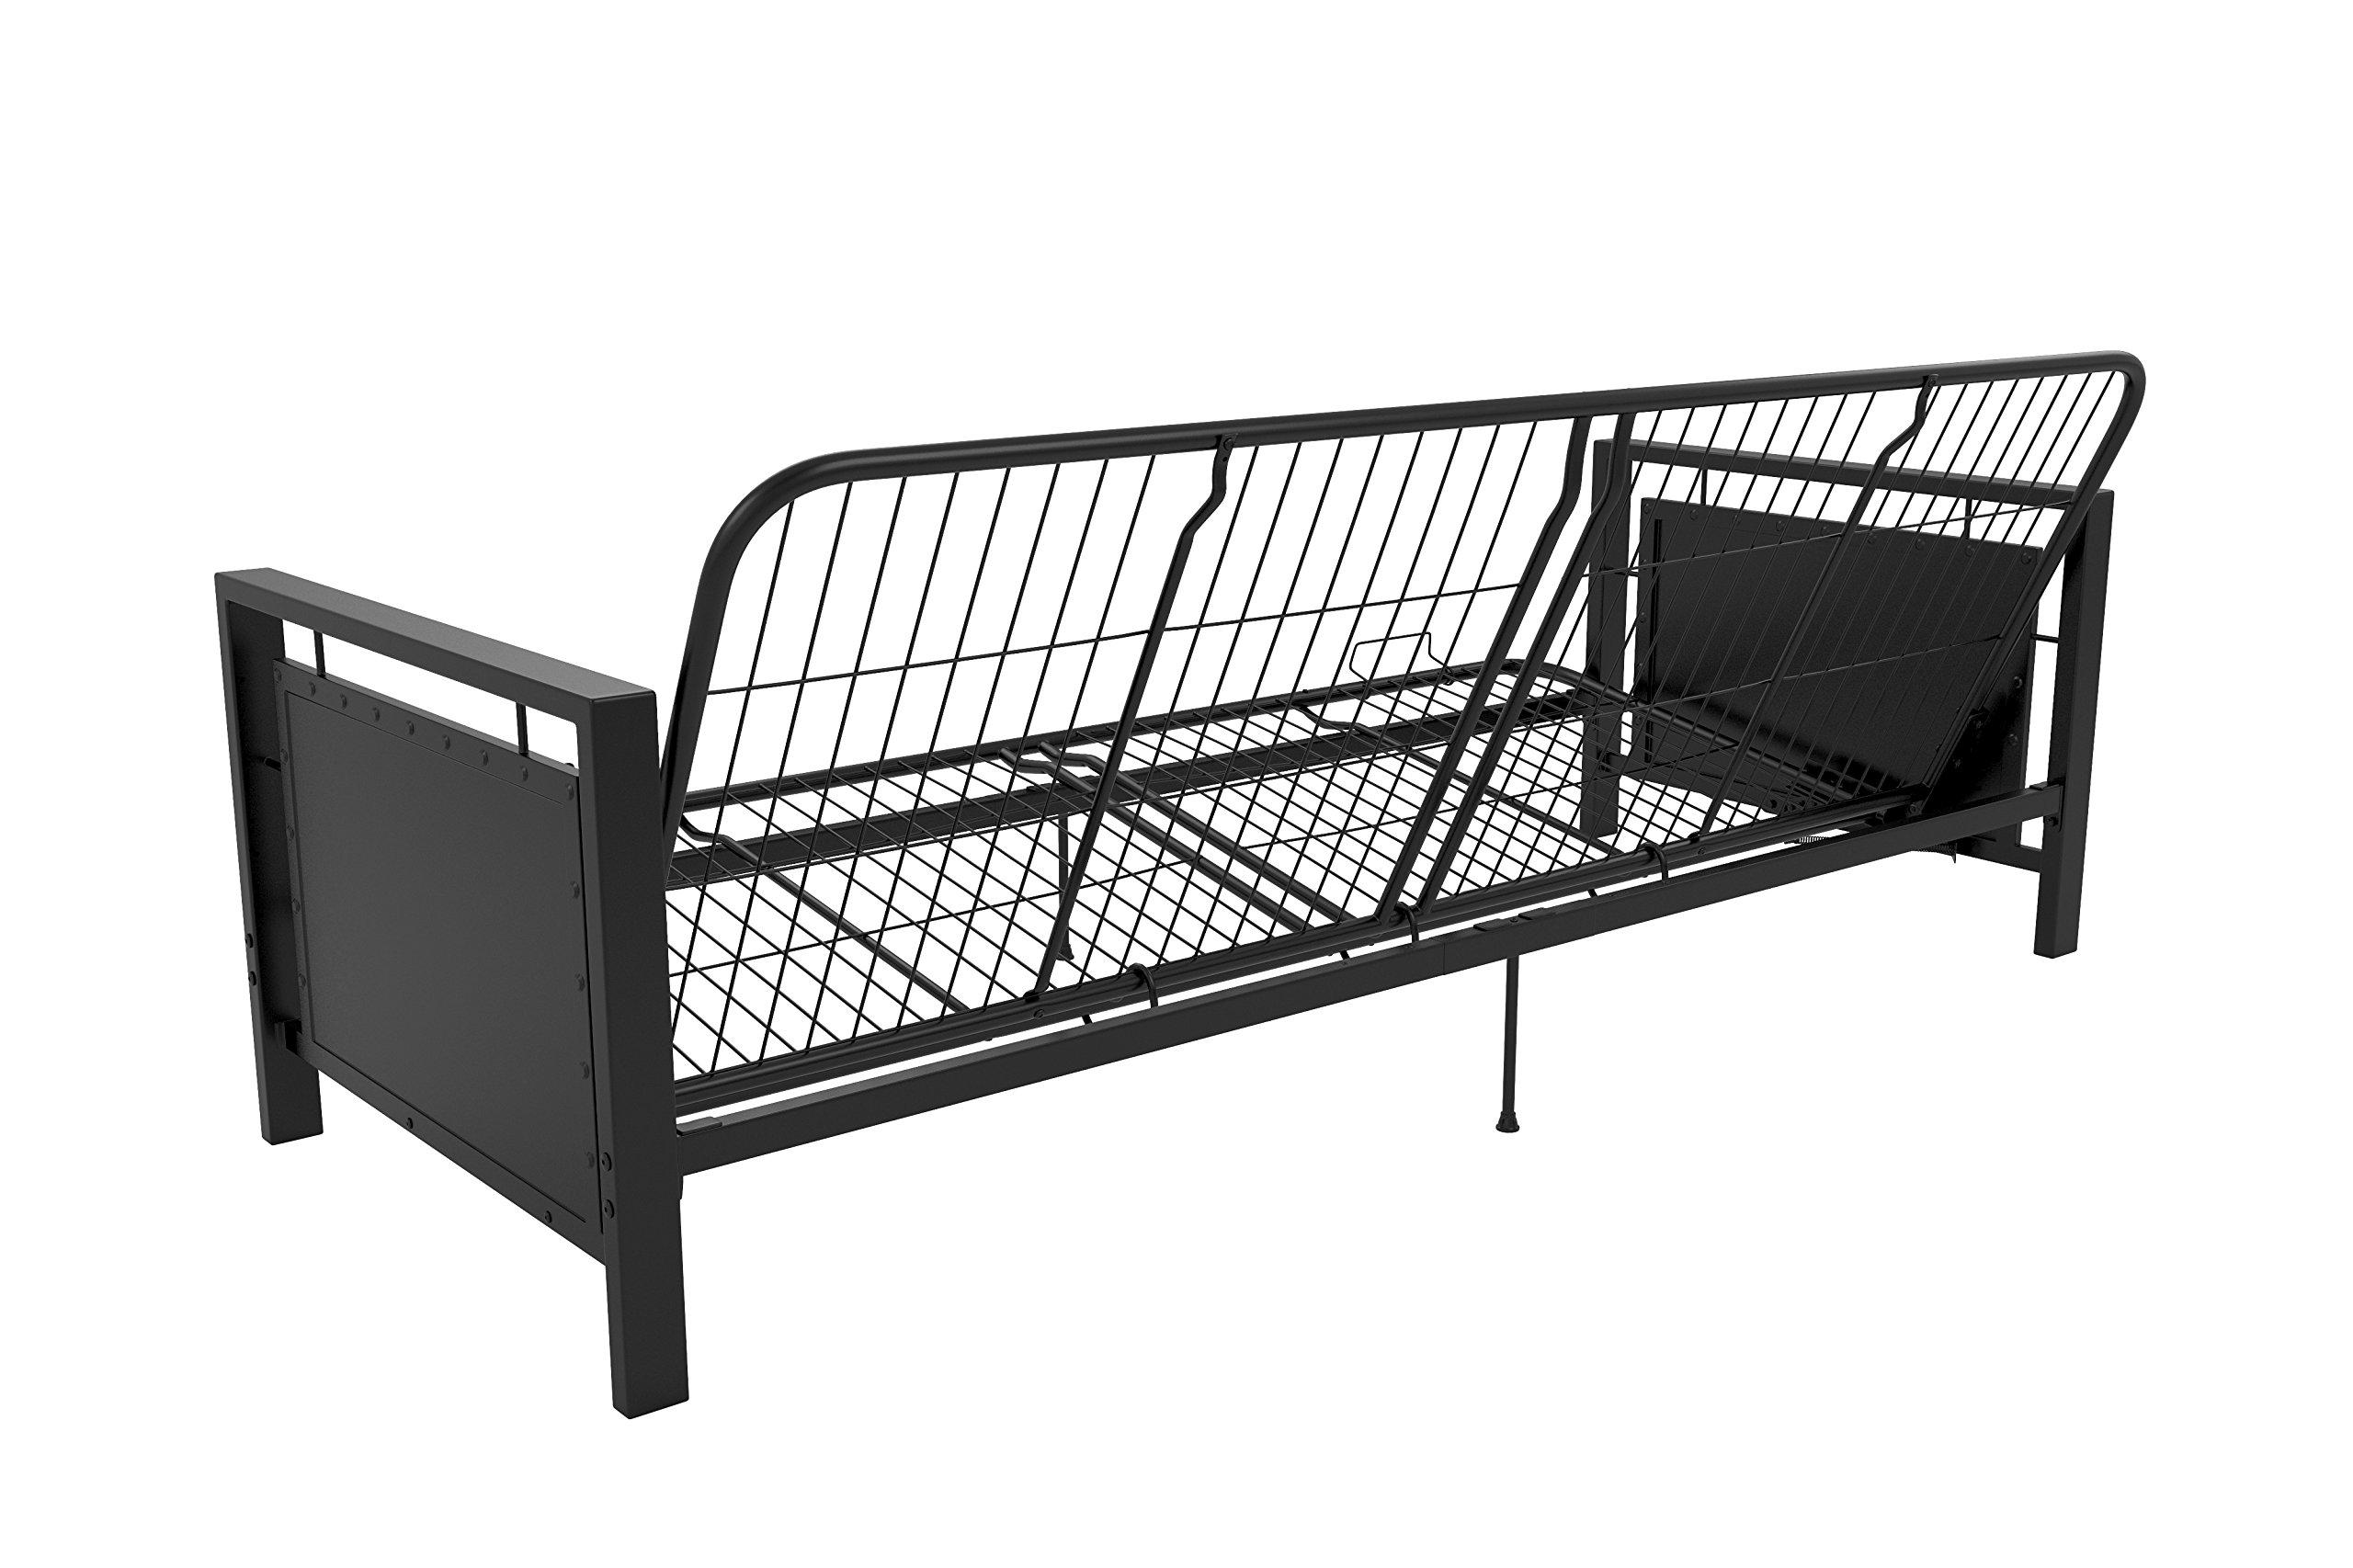 DHP Henley Metal Arm Futon Frame, Industrial Loft Design, Converts to Sleeper, Black Sturdy Metal by DHP (Image #9)